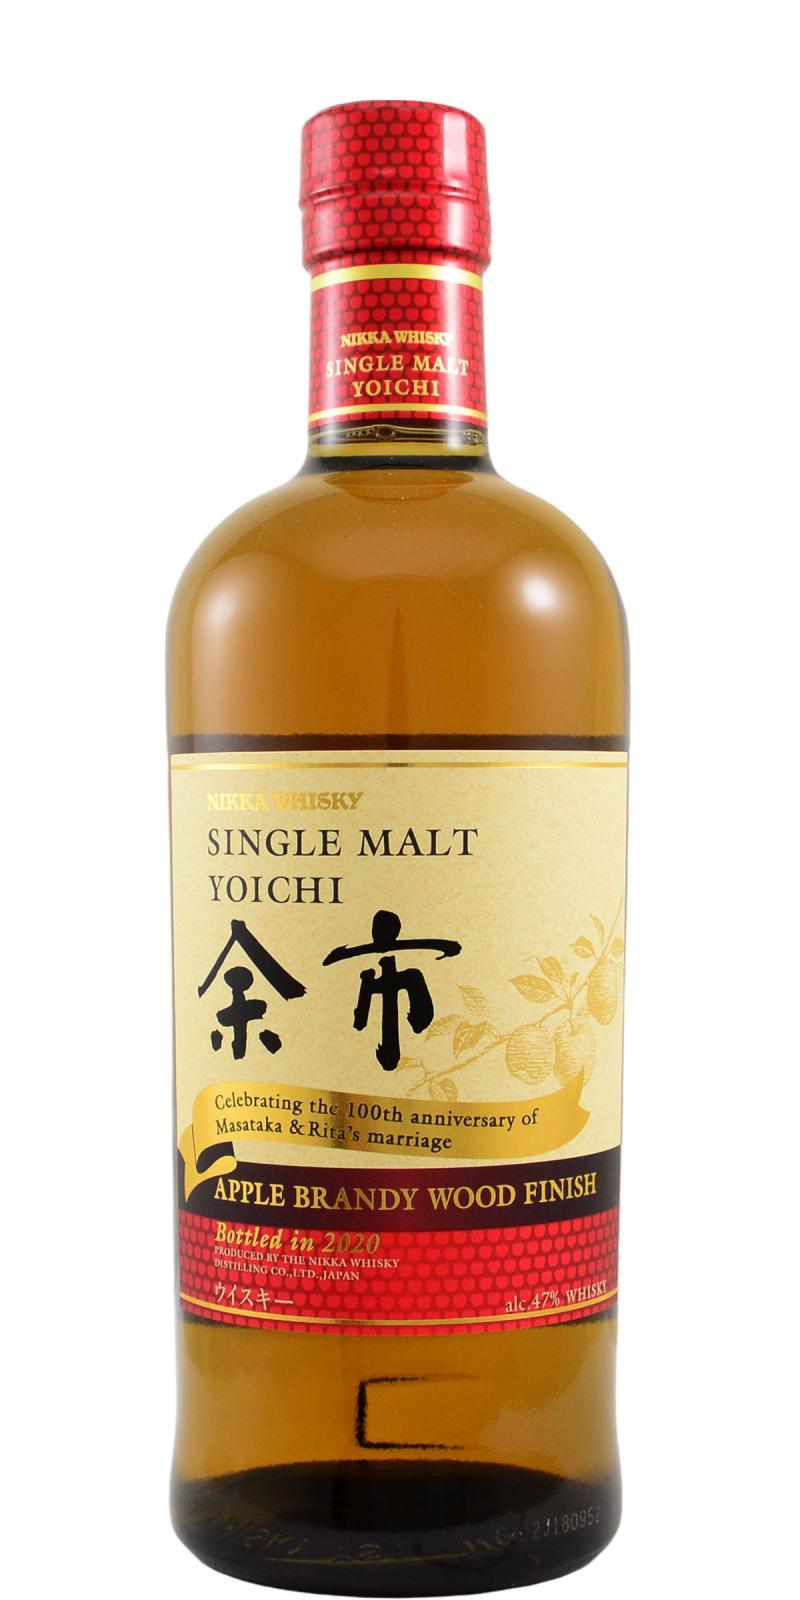 Yoichi Apple Brandy Wood Finish